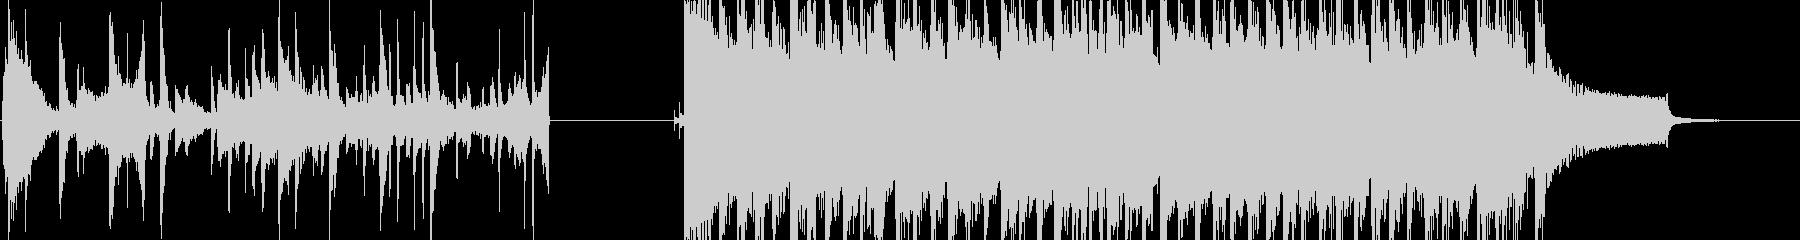 CMの未再生の波形